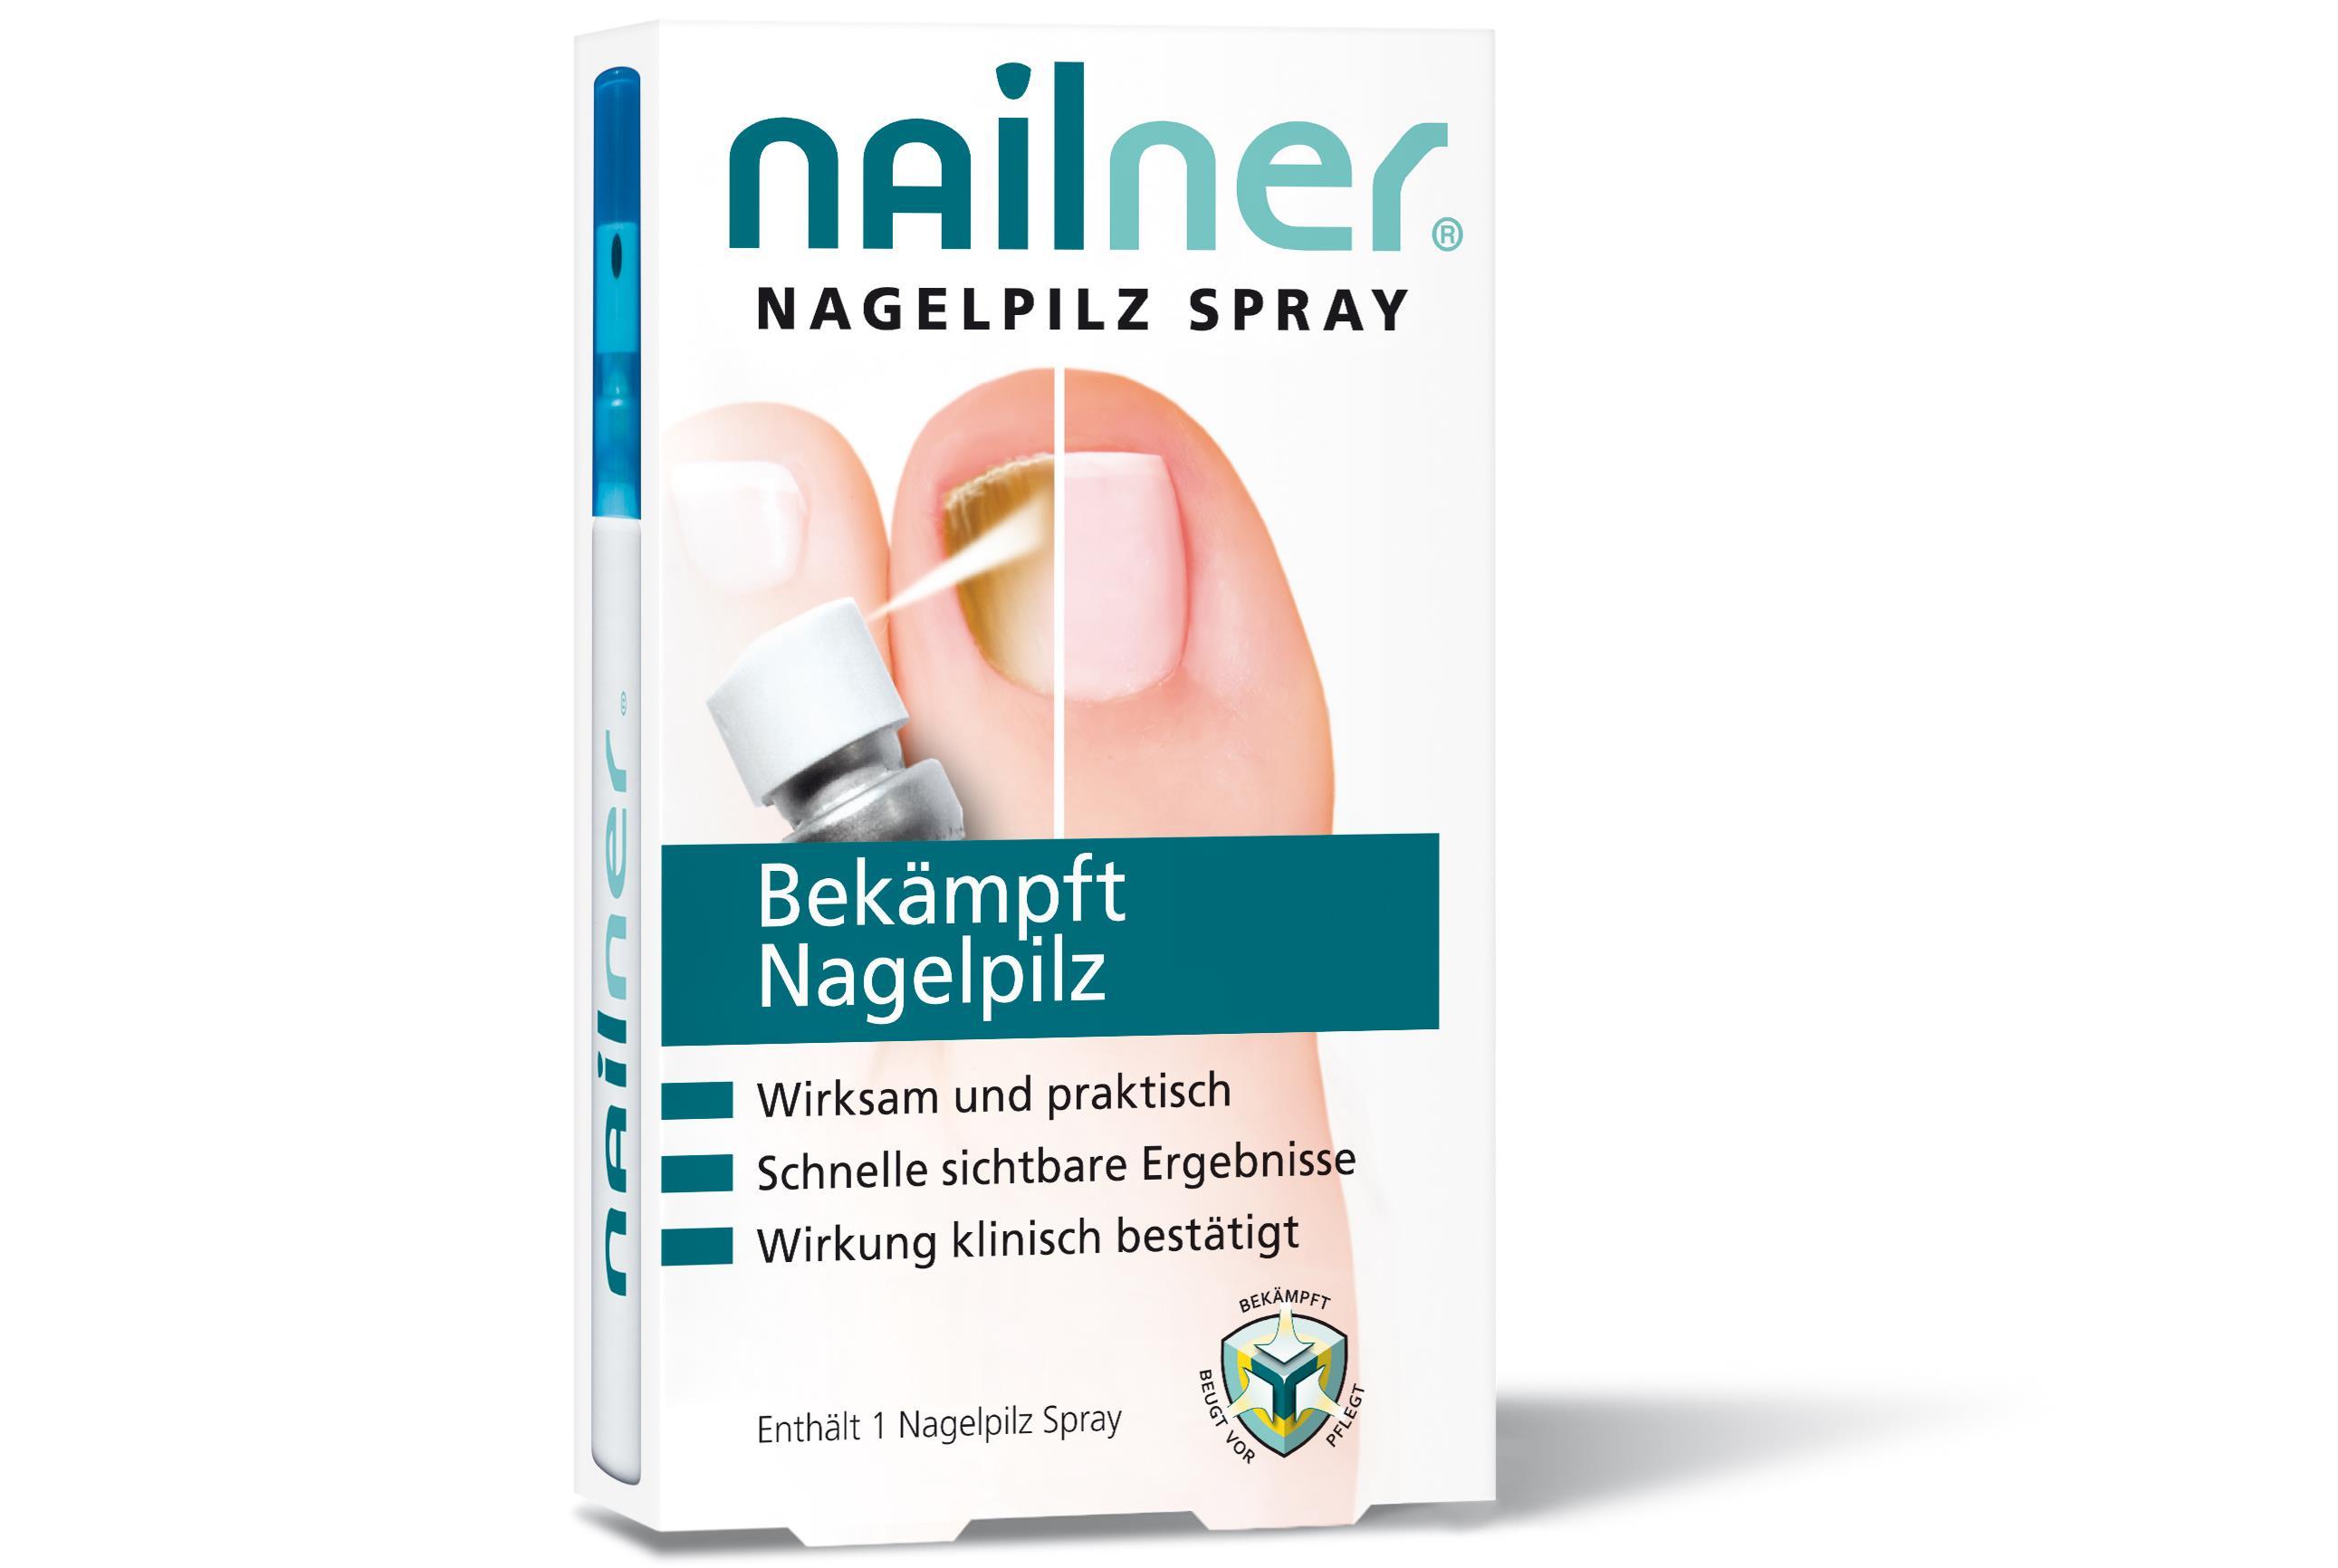 Nailner Nagelpilz Spray